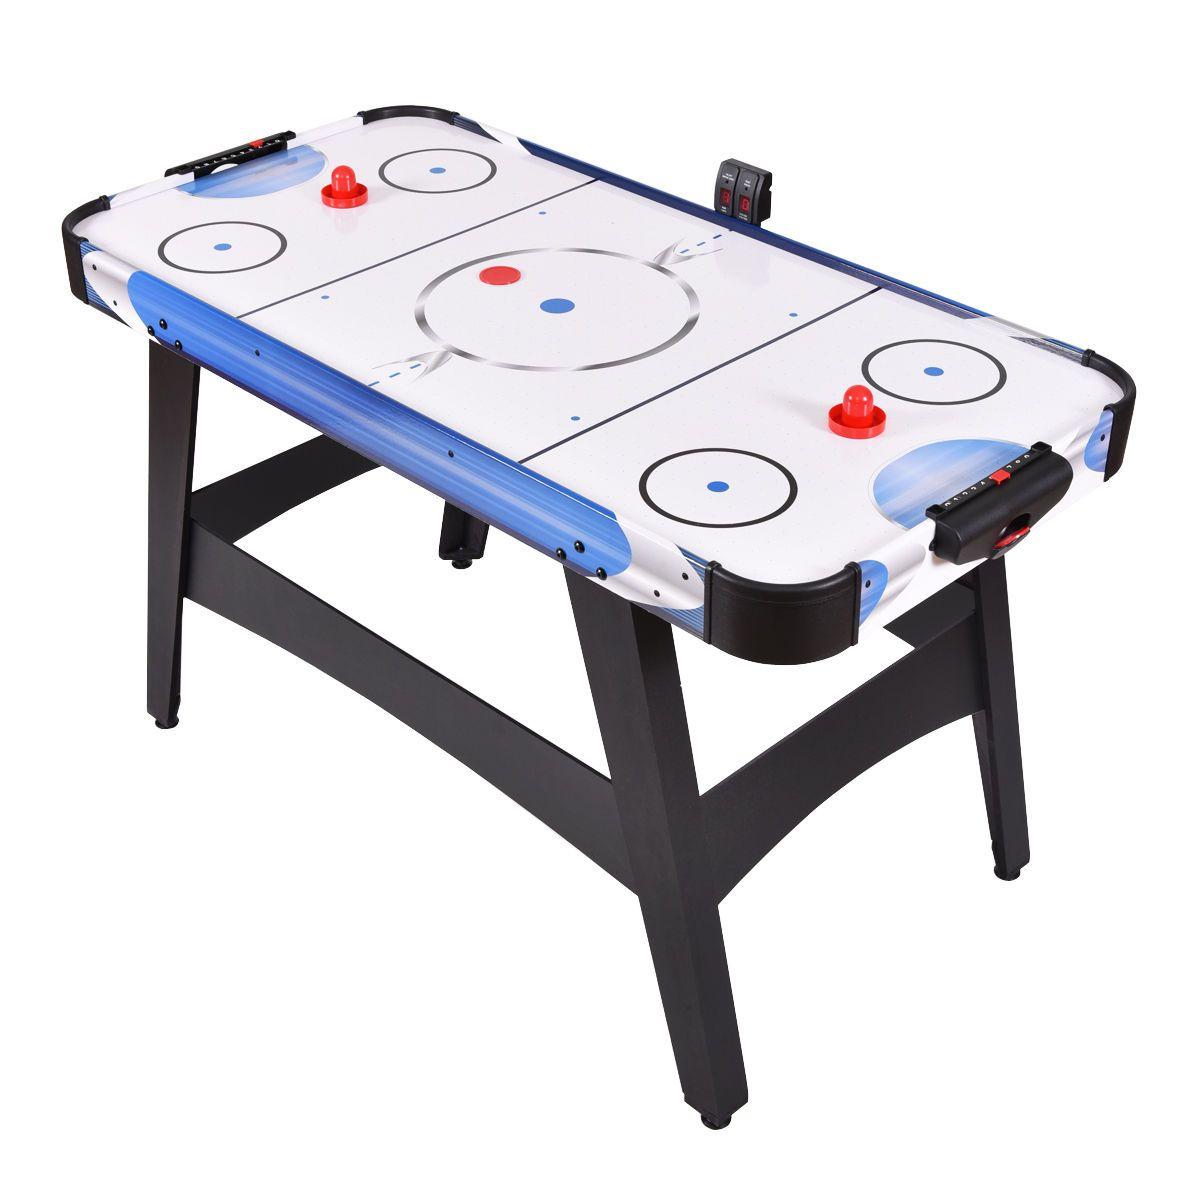 54 Indoor Sports Air Powered Hockey Table Indoor Sports Air Hockey Indoor Sports Games